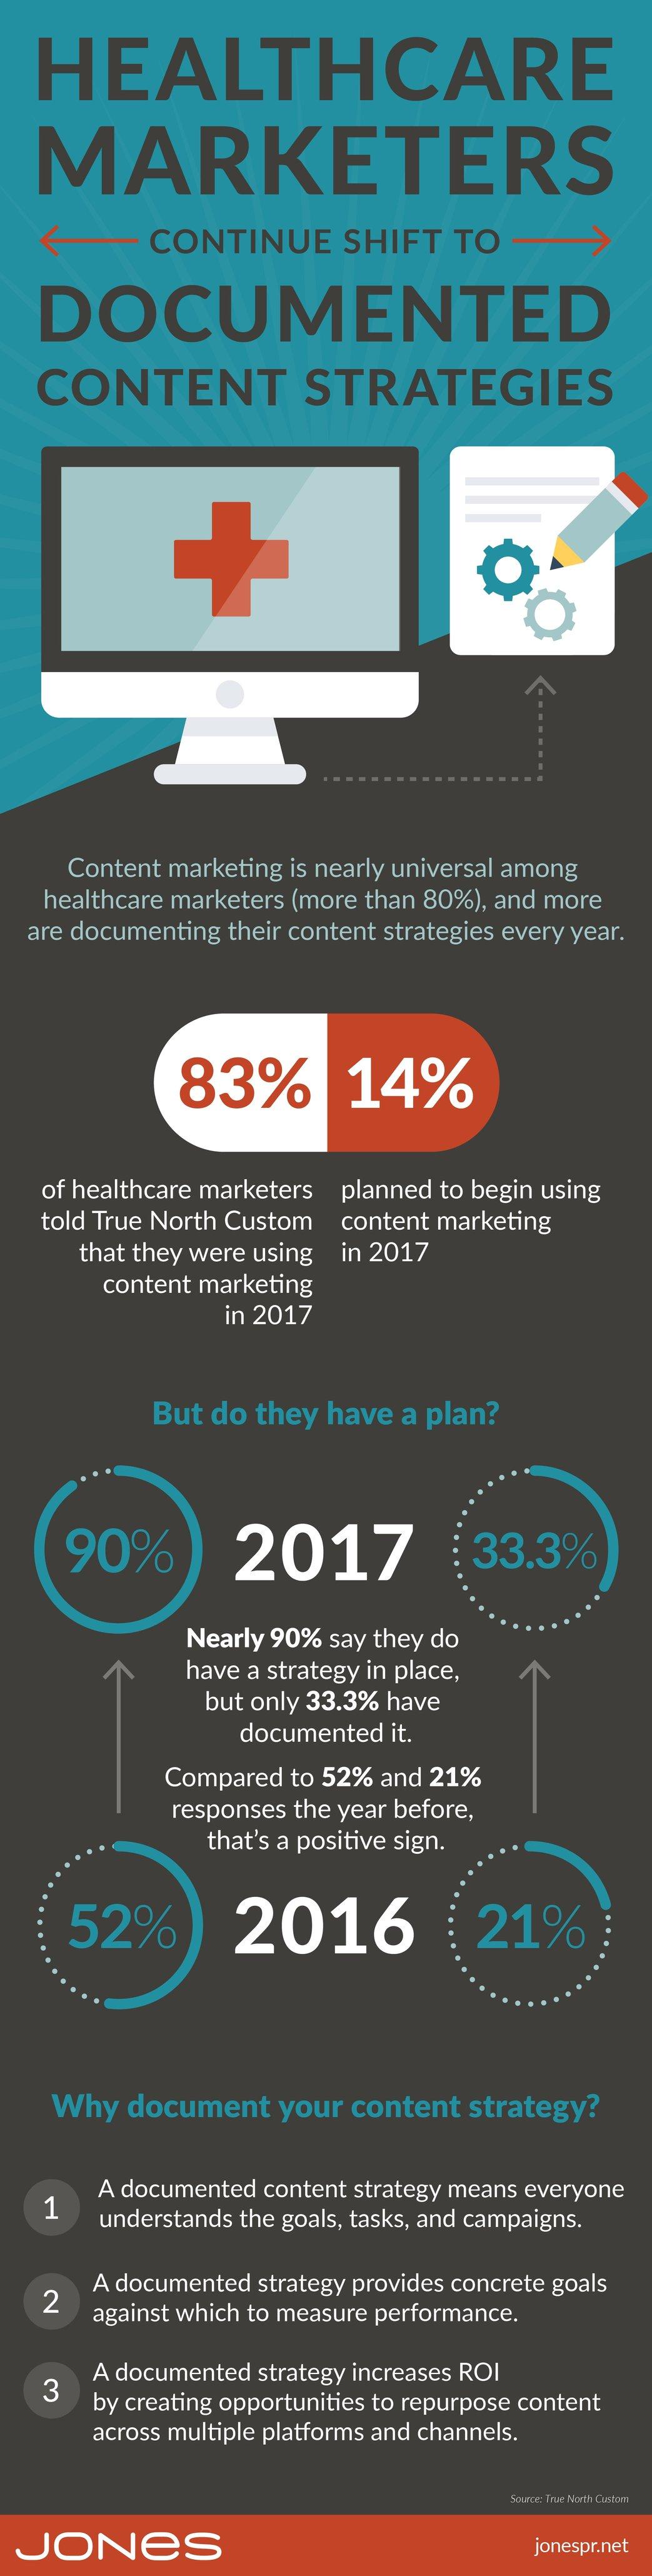 jones-infographic-healthcare-content-marketing-changes-v2